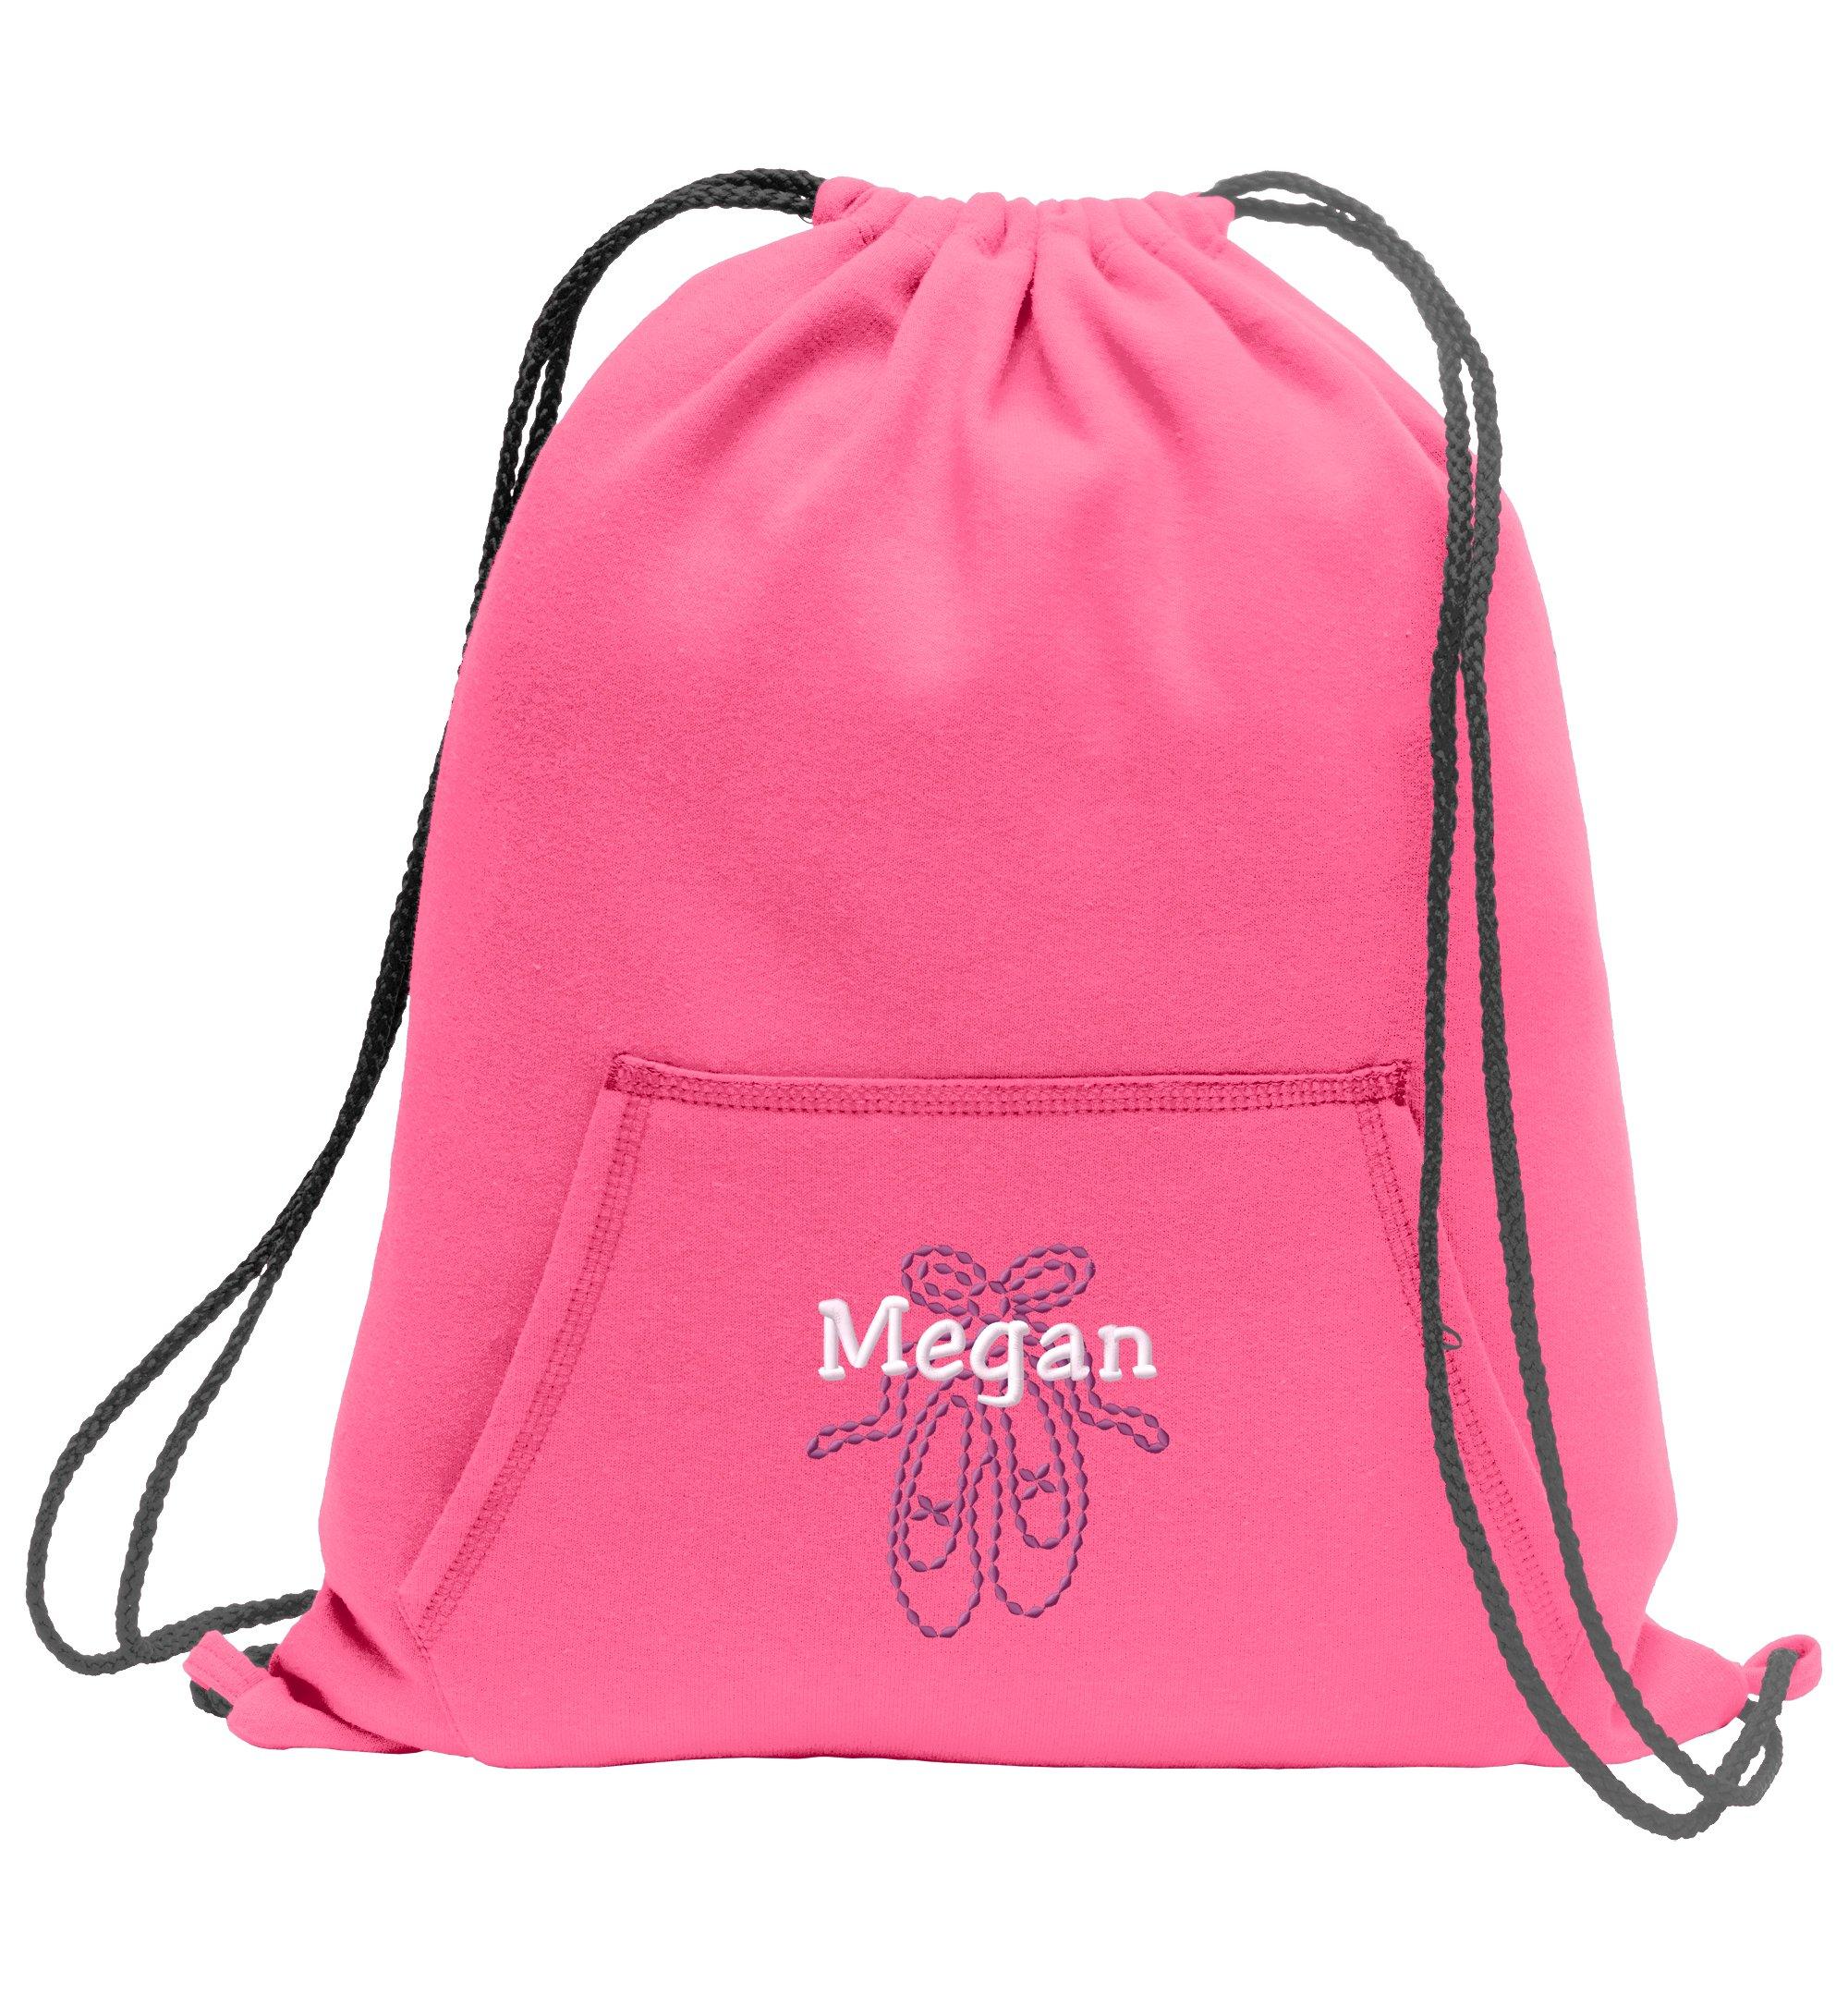 Ballet Shoes Personalized - Sweatshirt Cinch Bag with Kangaroo Pocket (Neon Pink)